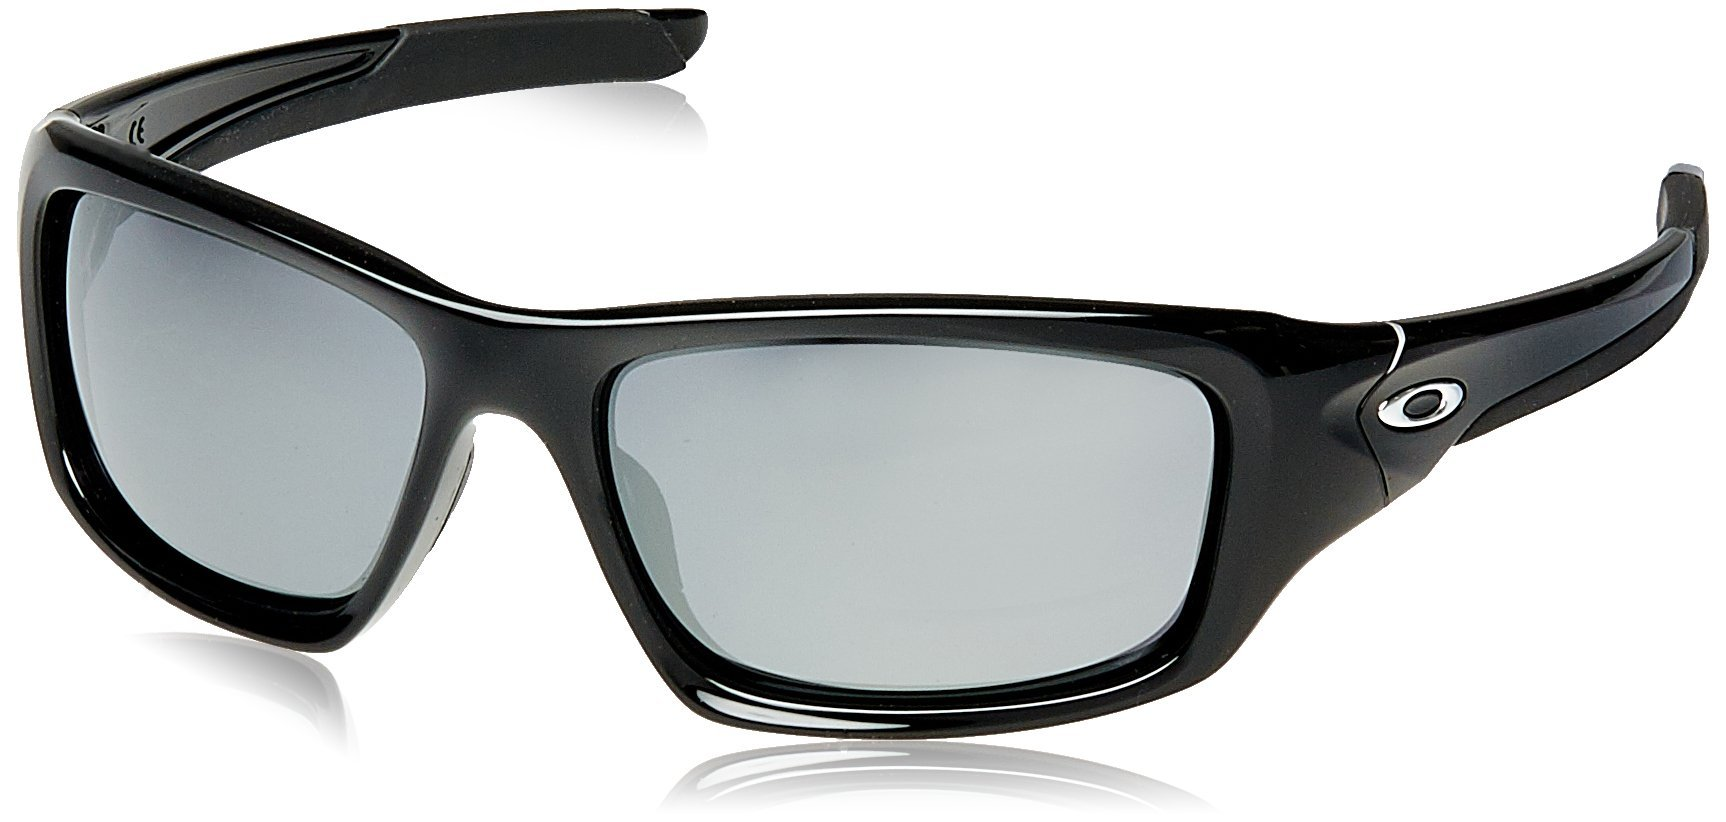 Oakley Valve Non-polarized Rectangular Sunglasses,Polished Black w/ Black Iridium,60 mm by Oakley